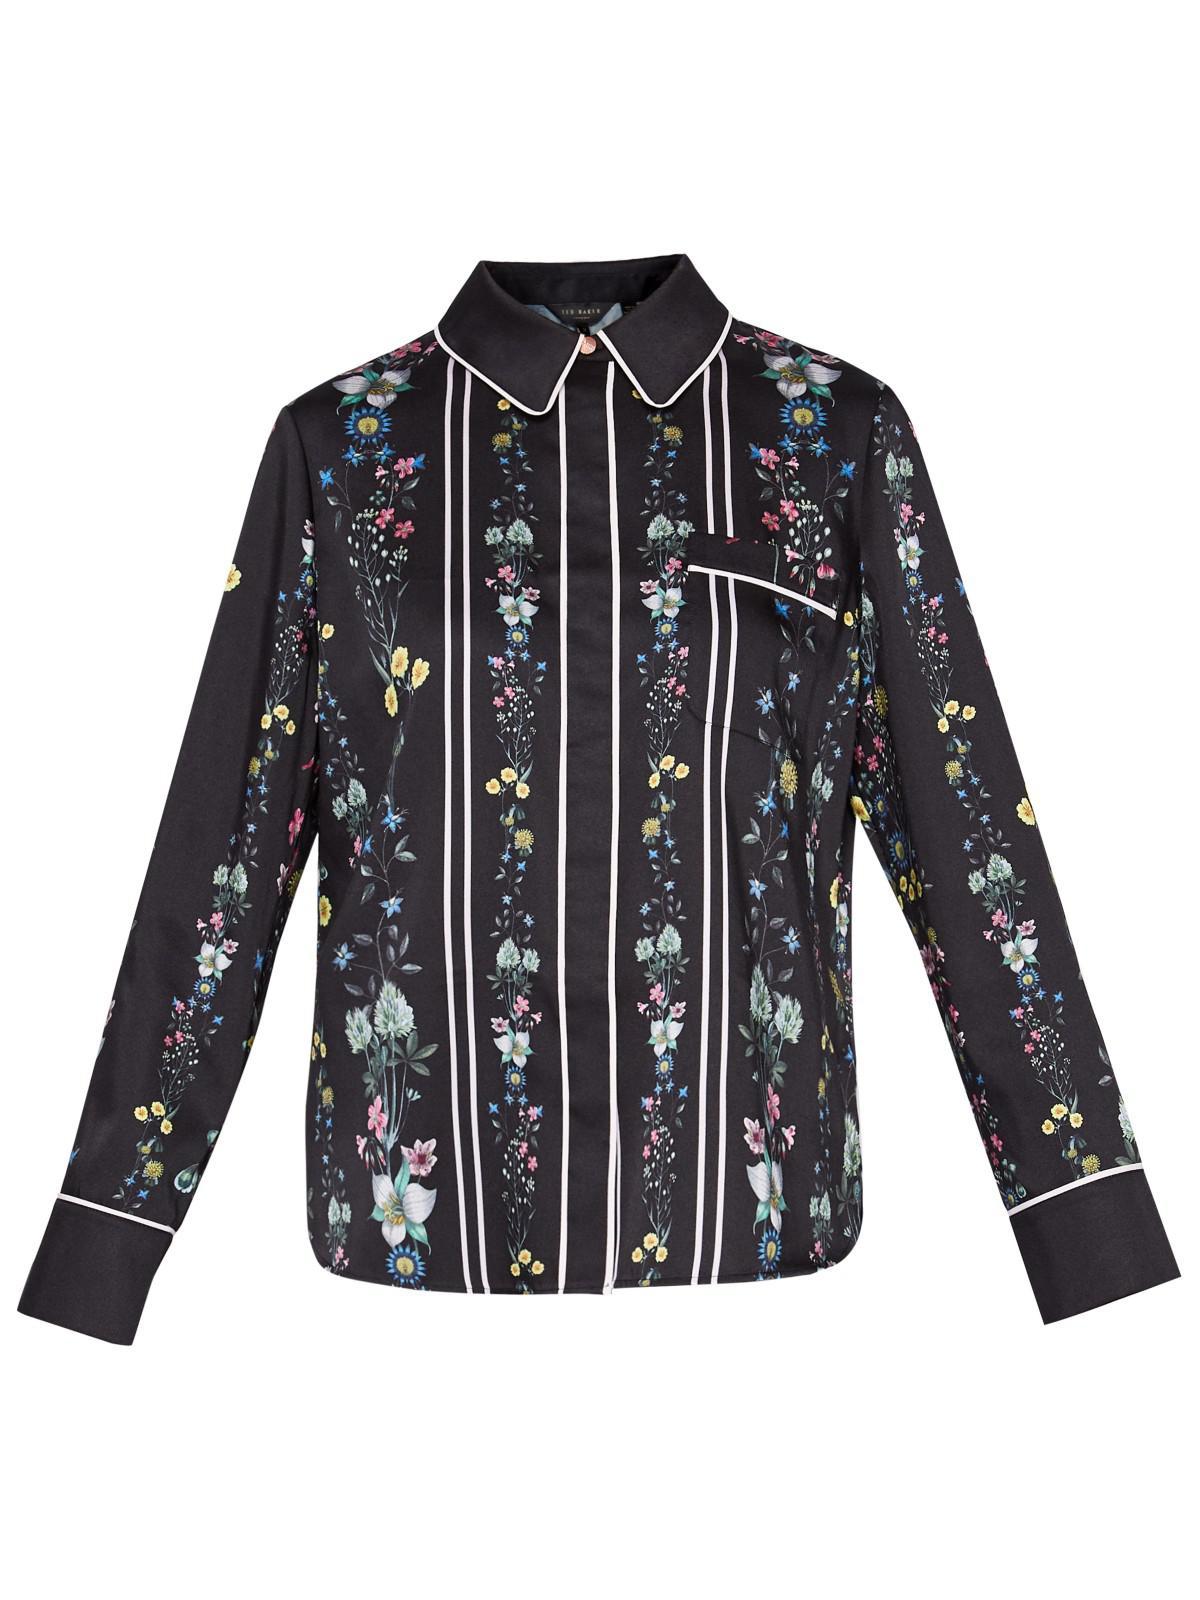 1f108efdd660a6 Ted Baker Lottu Unity Floral Blouse in Black - Lyst